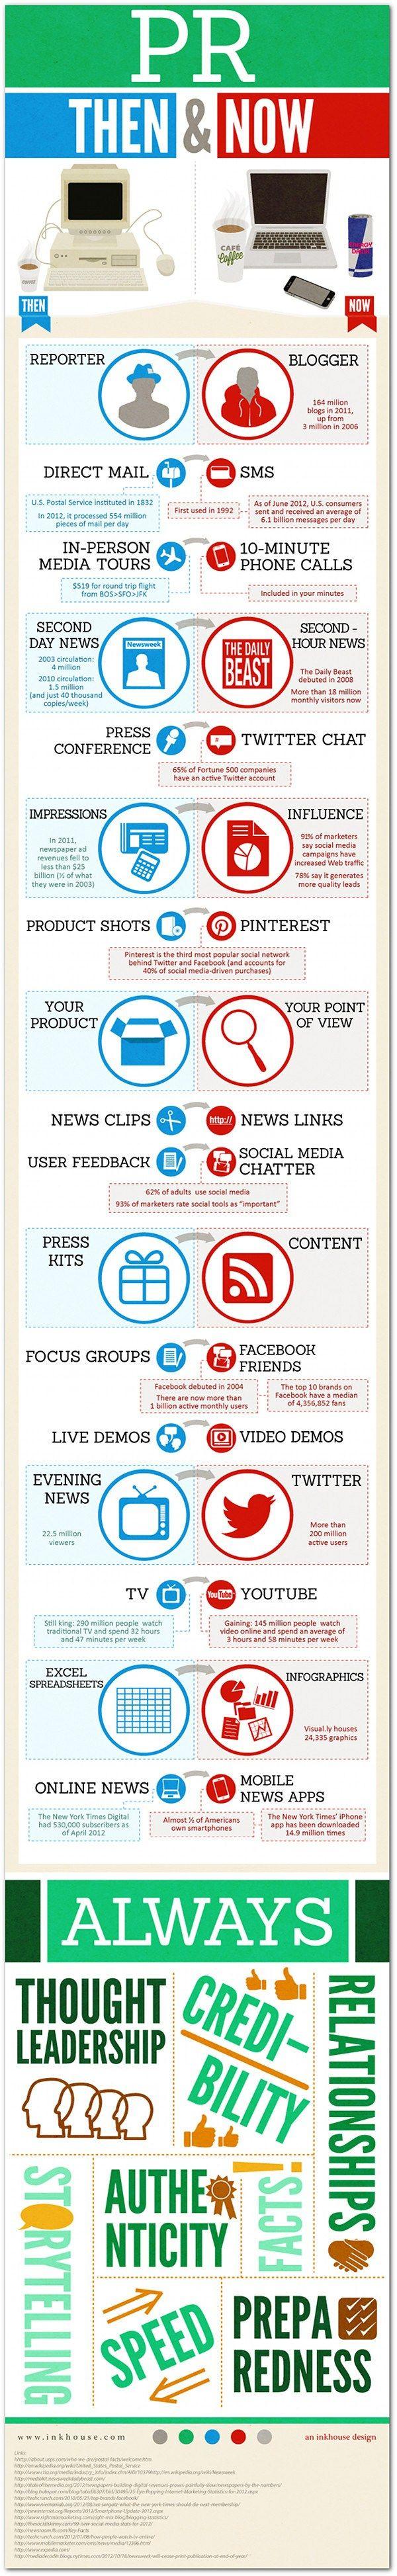 Public Relations: Then & Now